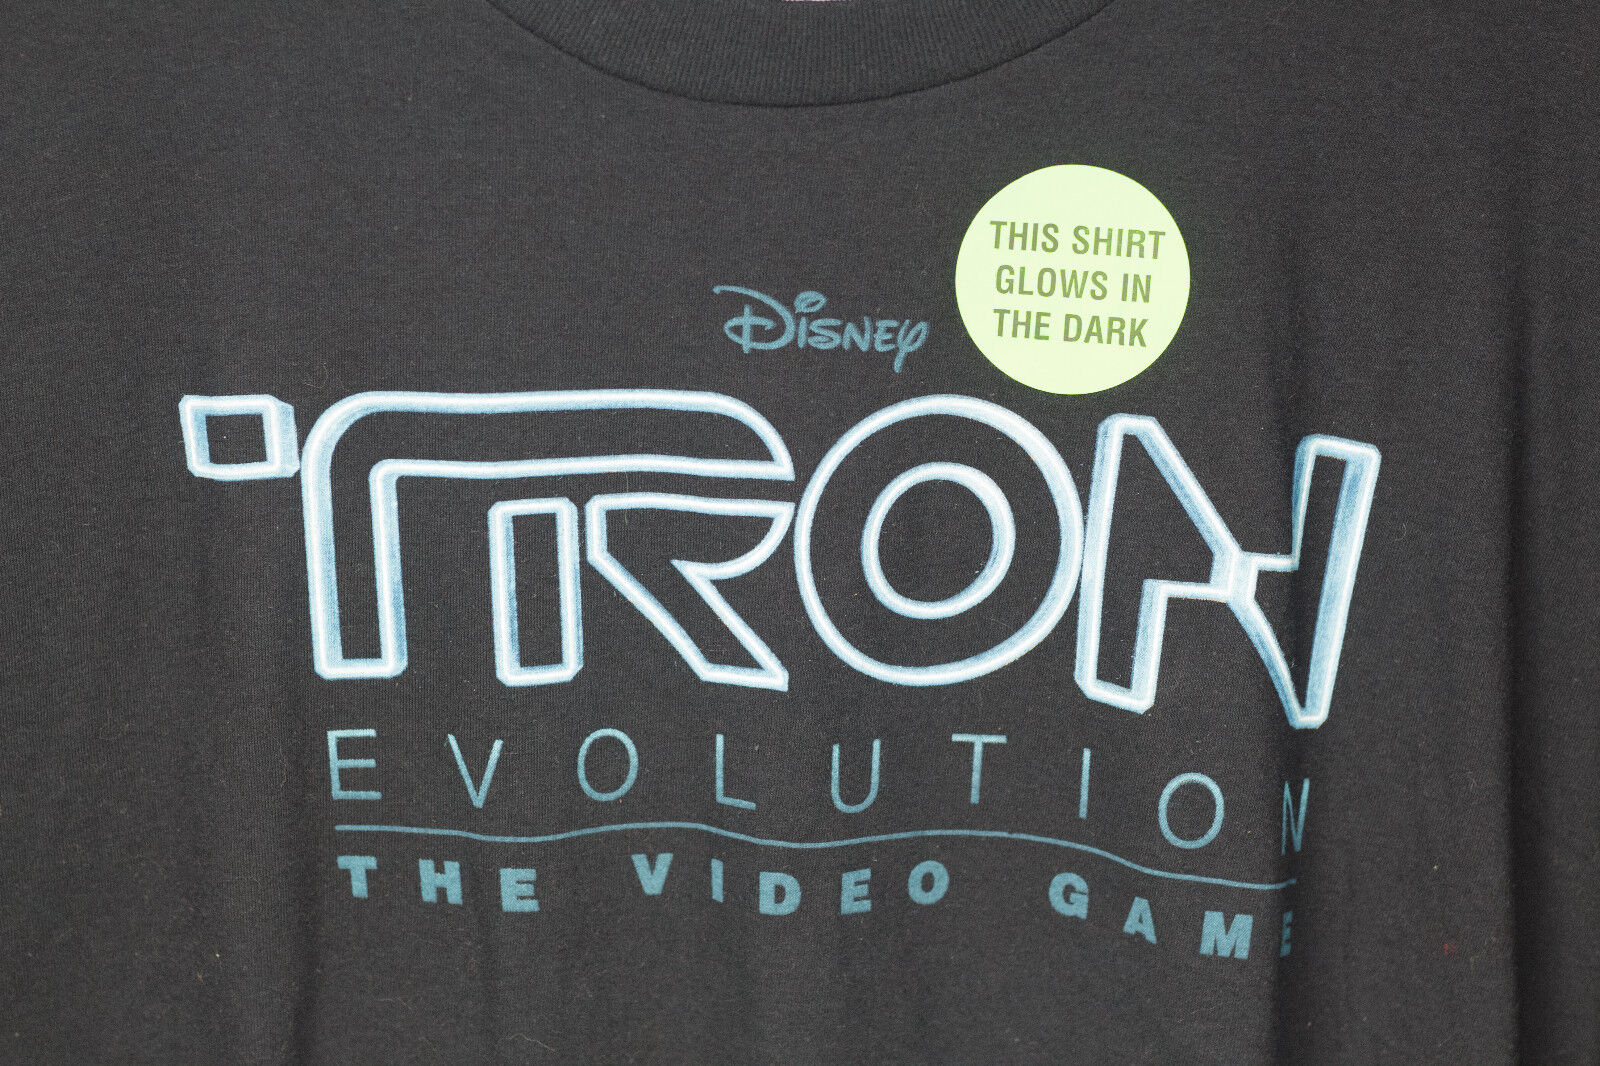 TRON EVOLUTION THE VIDEO GAME LEGACY DISNEY T-SHIRT MENS LARGE L T-SHIRT NEW